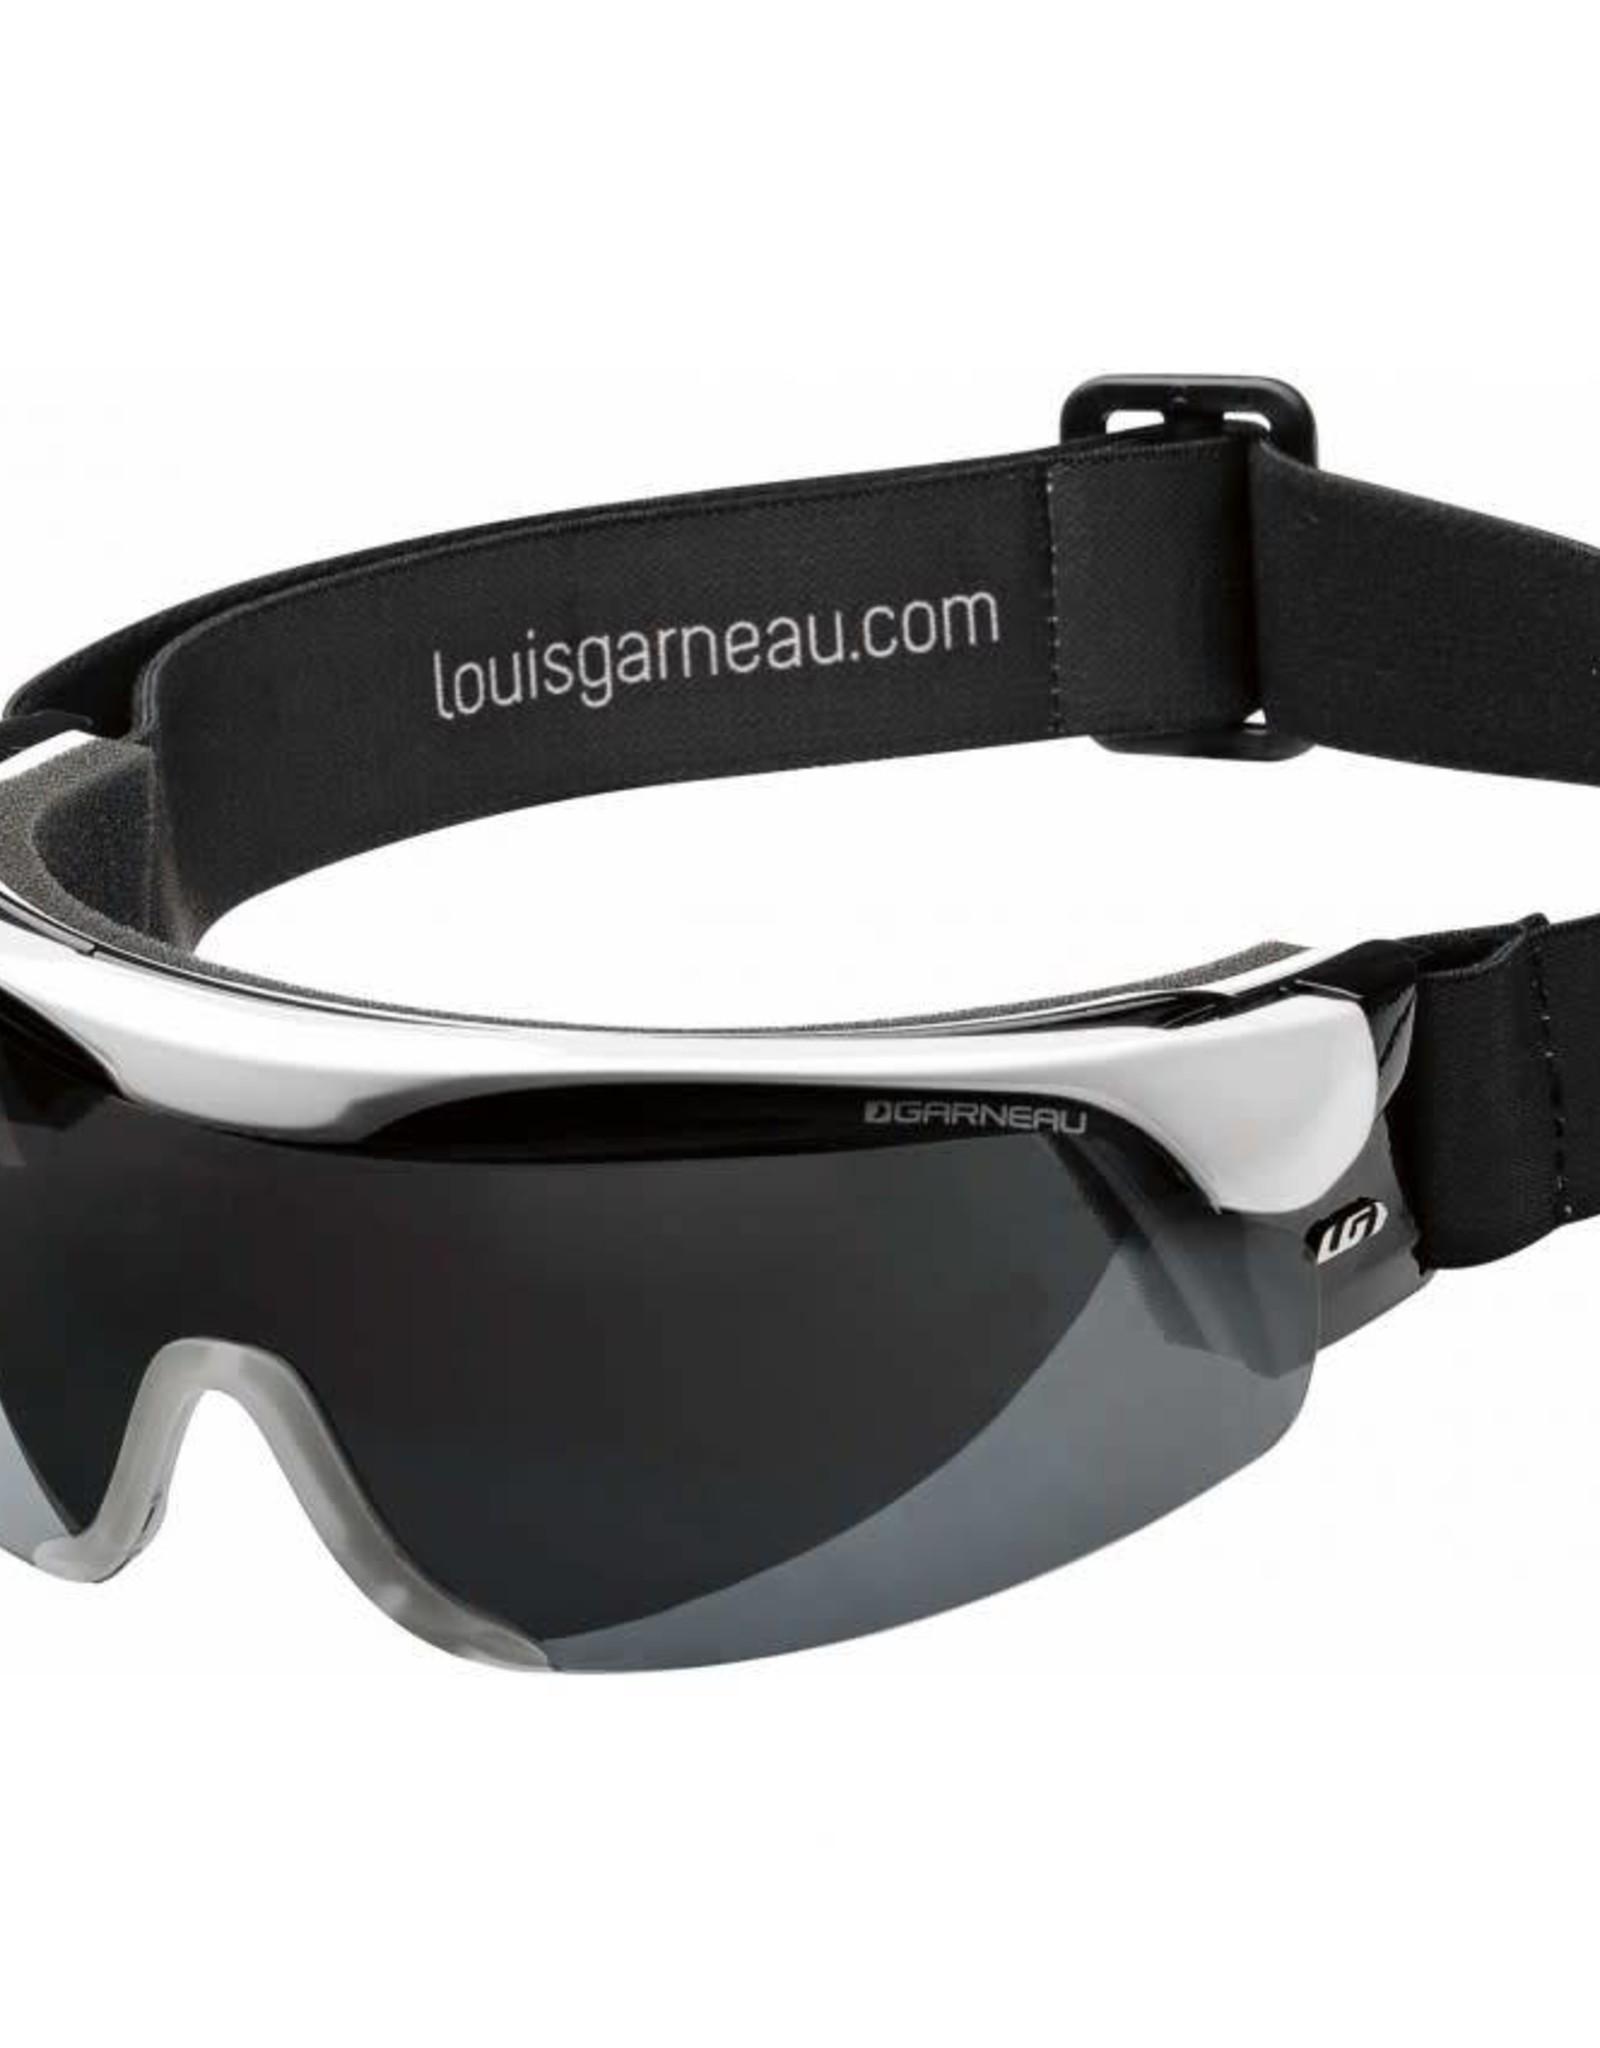 Louis Garneau LG Lunette Nordic Shield